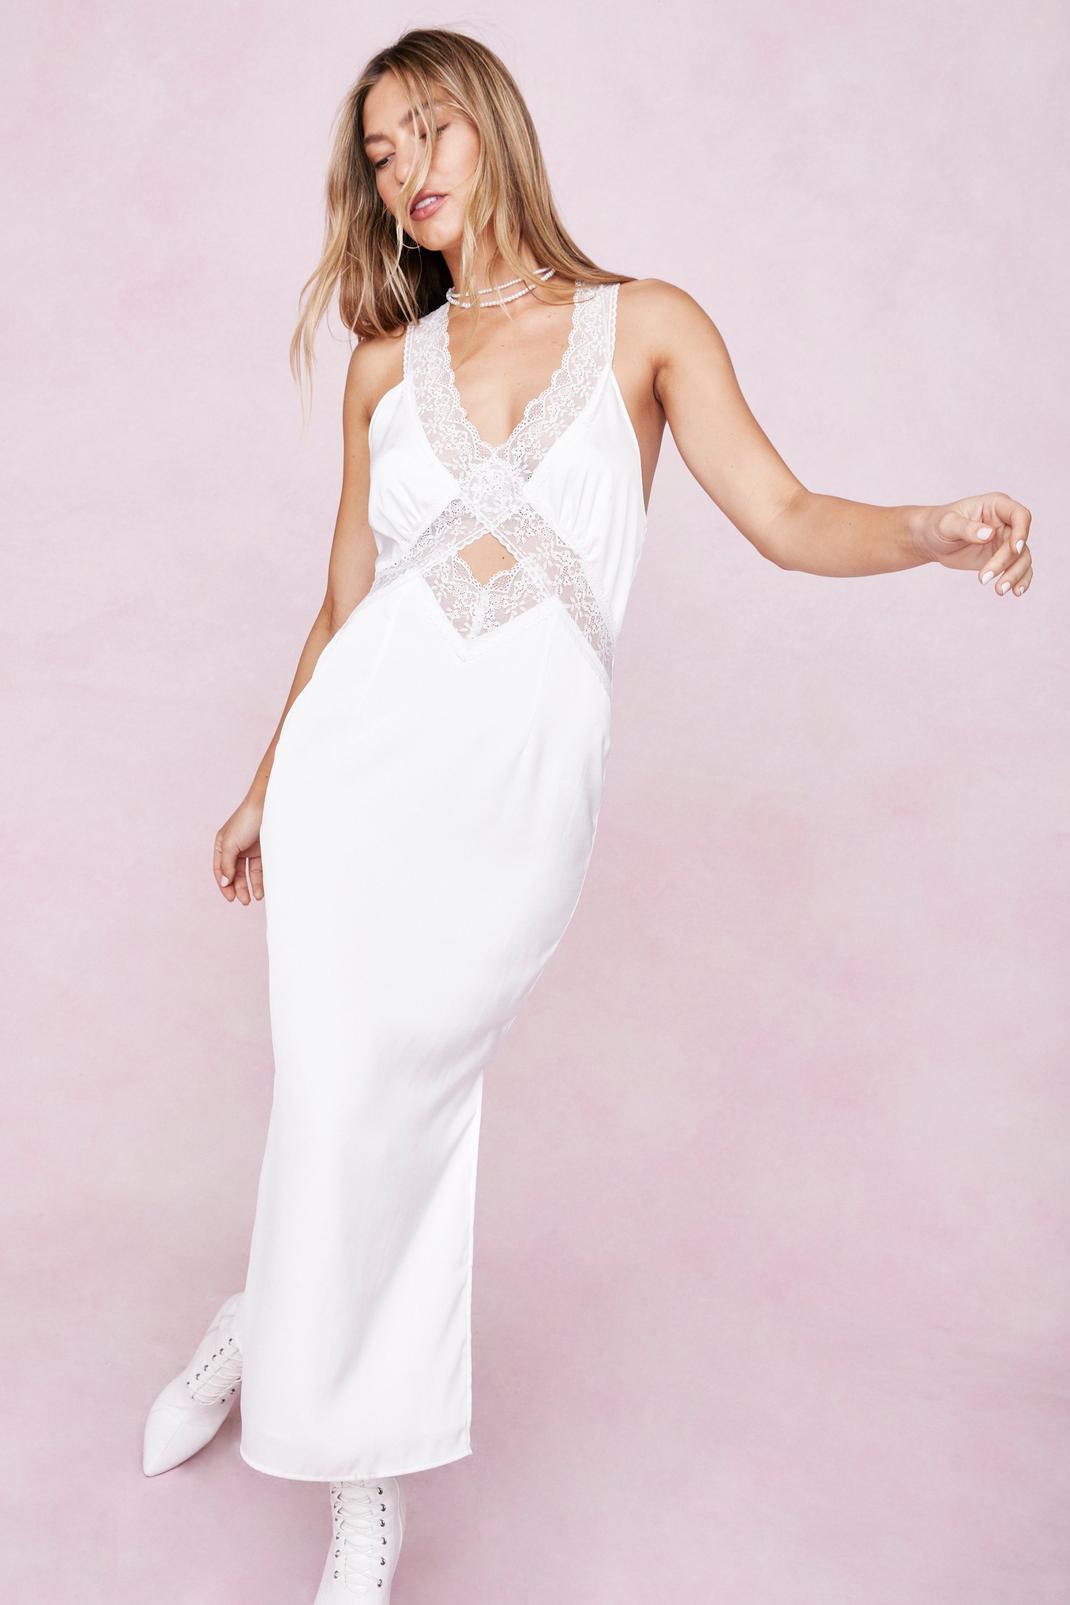 Satin Lace Trim Cut Out Midi Dress